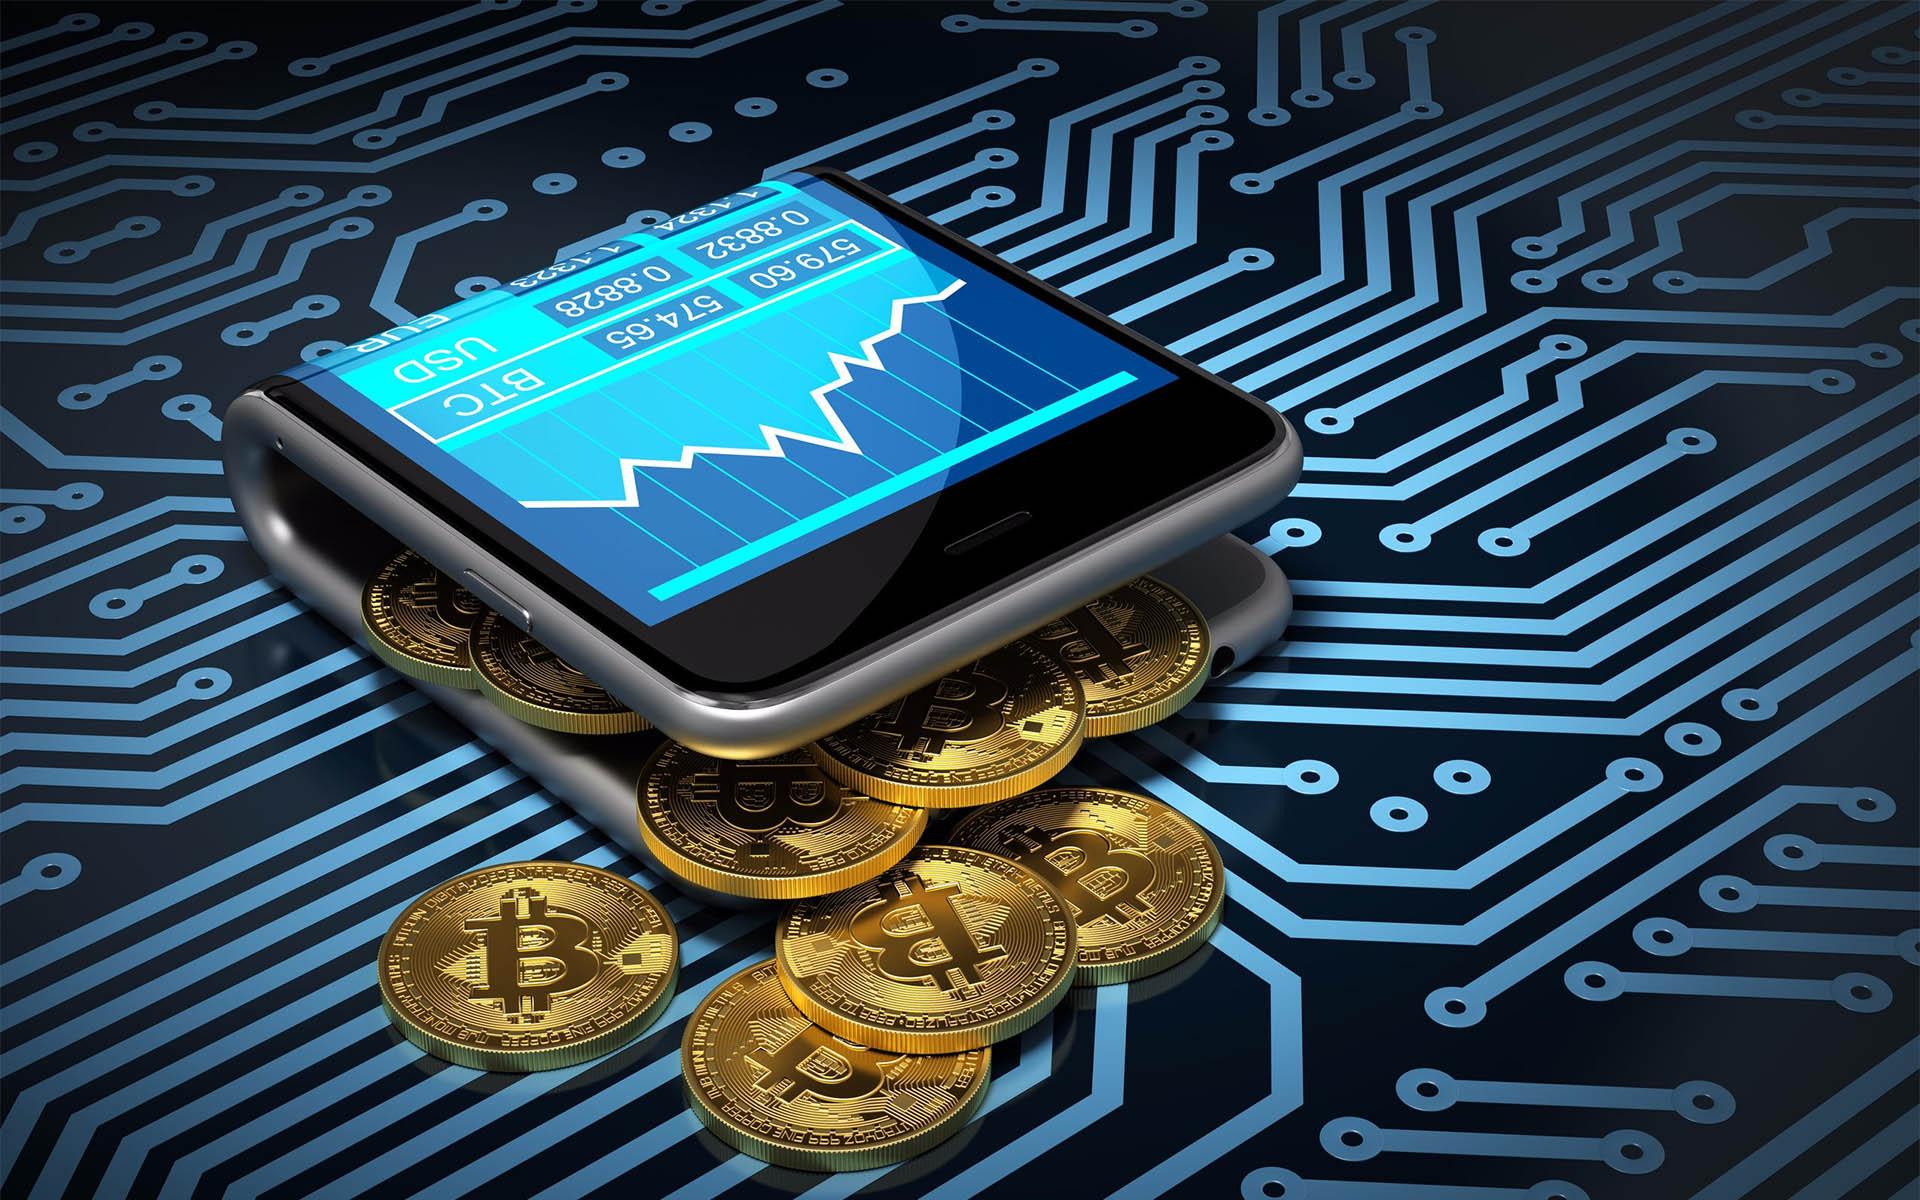 1000 bitcoine btc sahip adres sayısı arttı